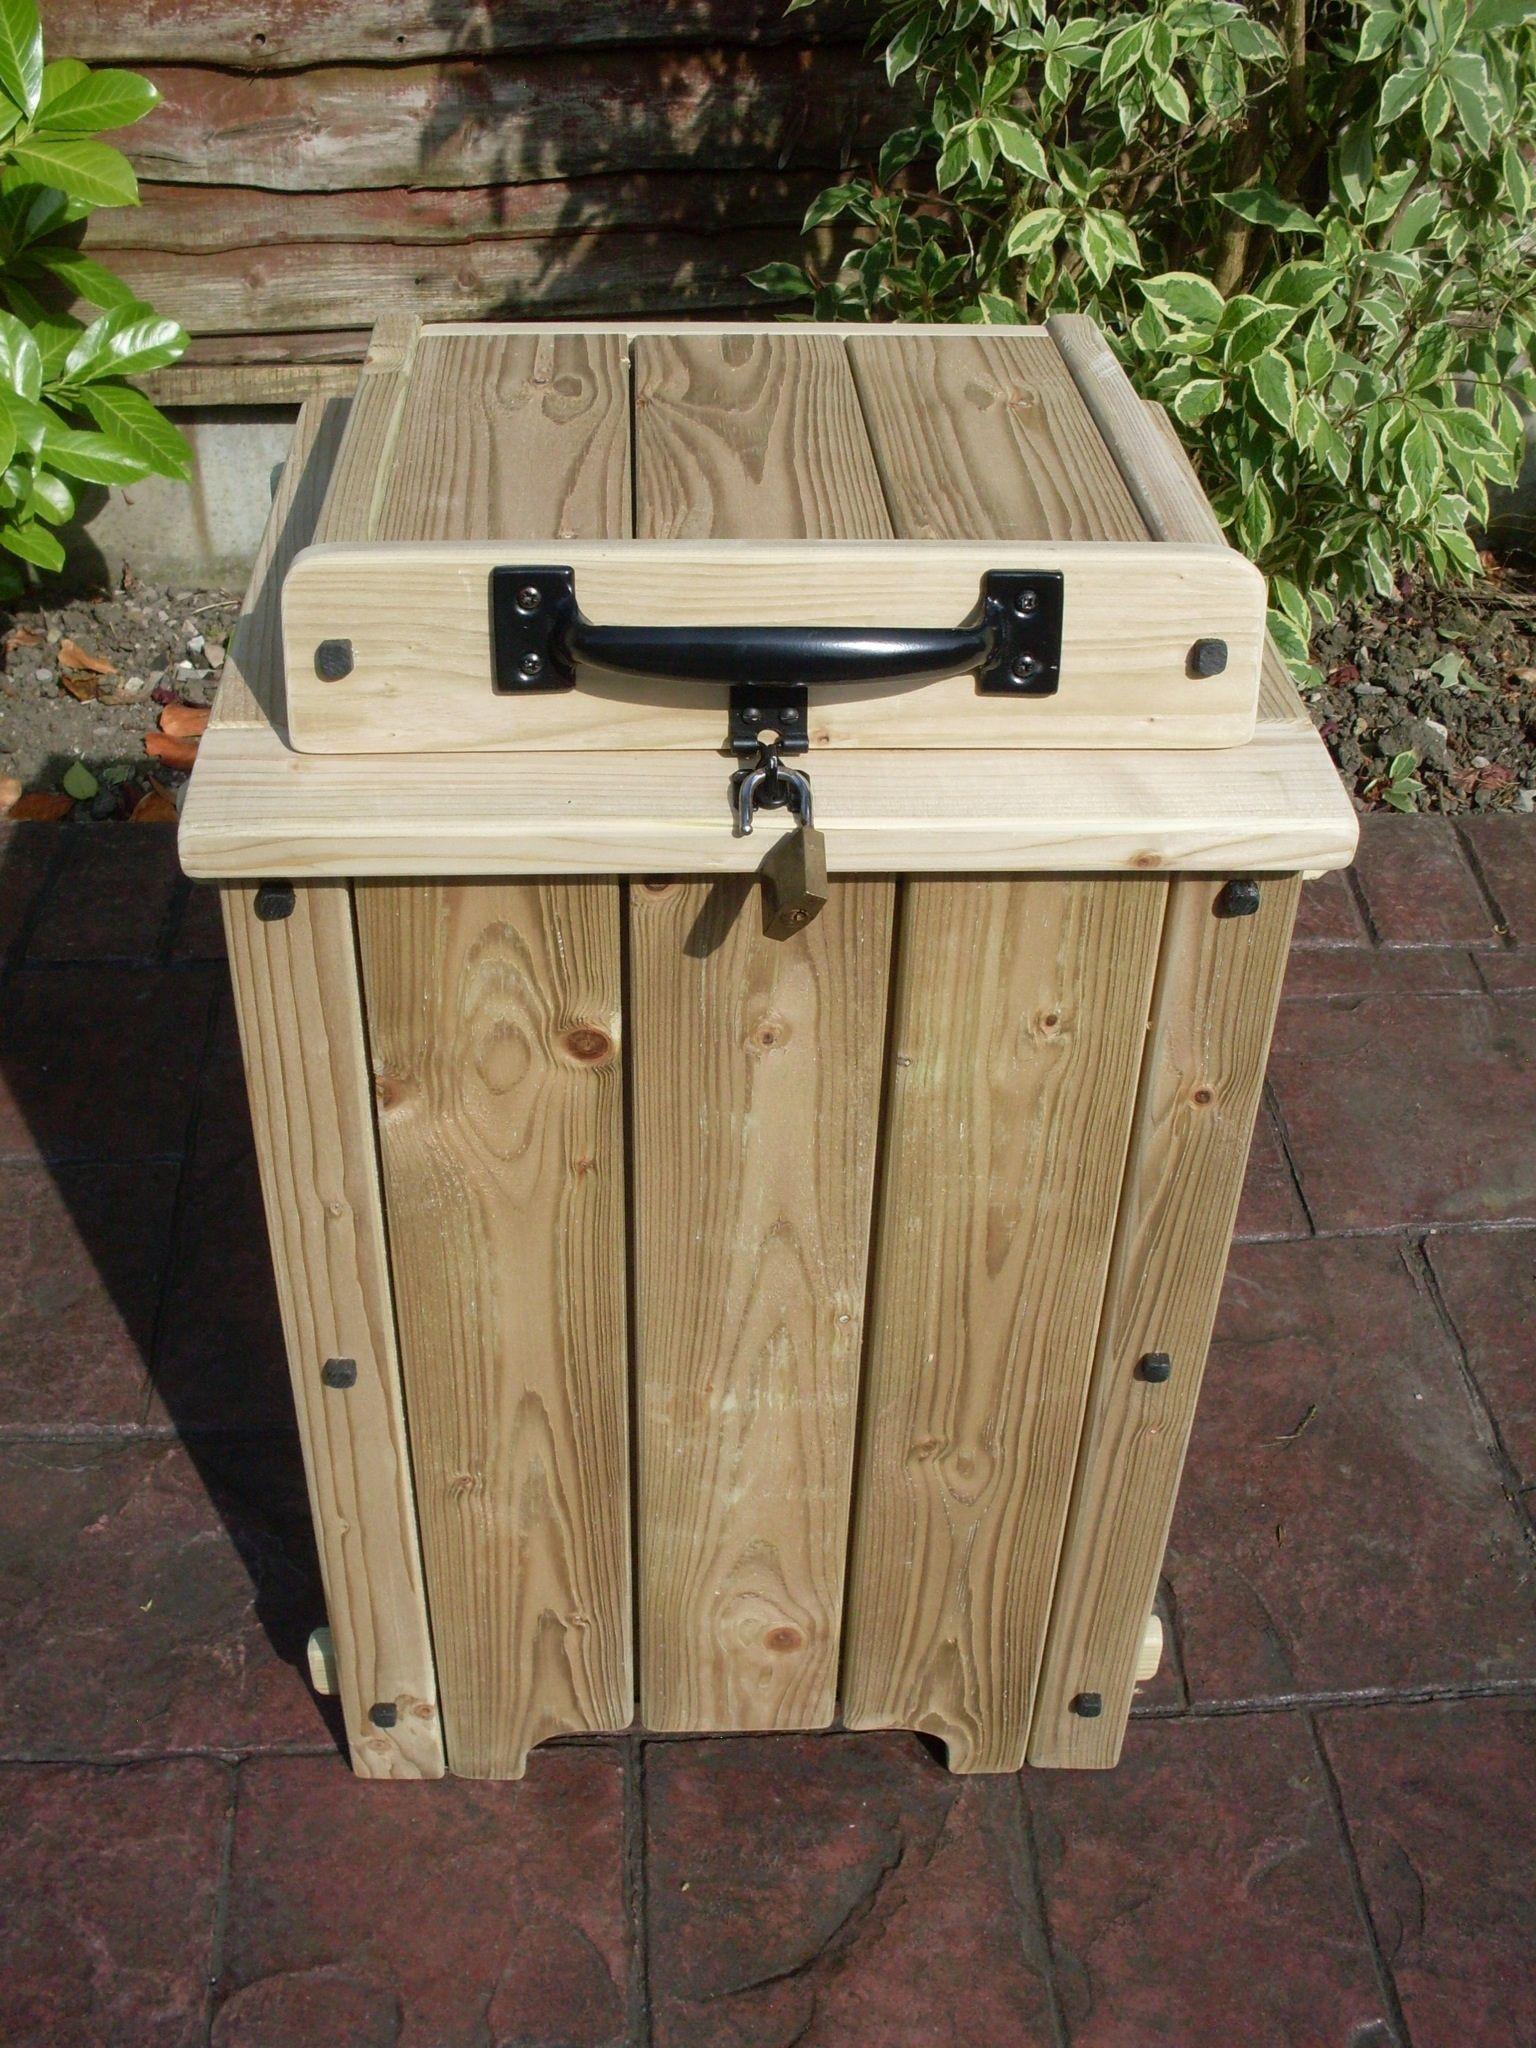 DIY Parcel Box  Parcel drop box KH Garden furniture Sturdy